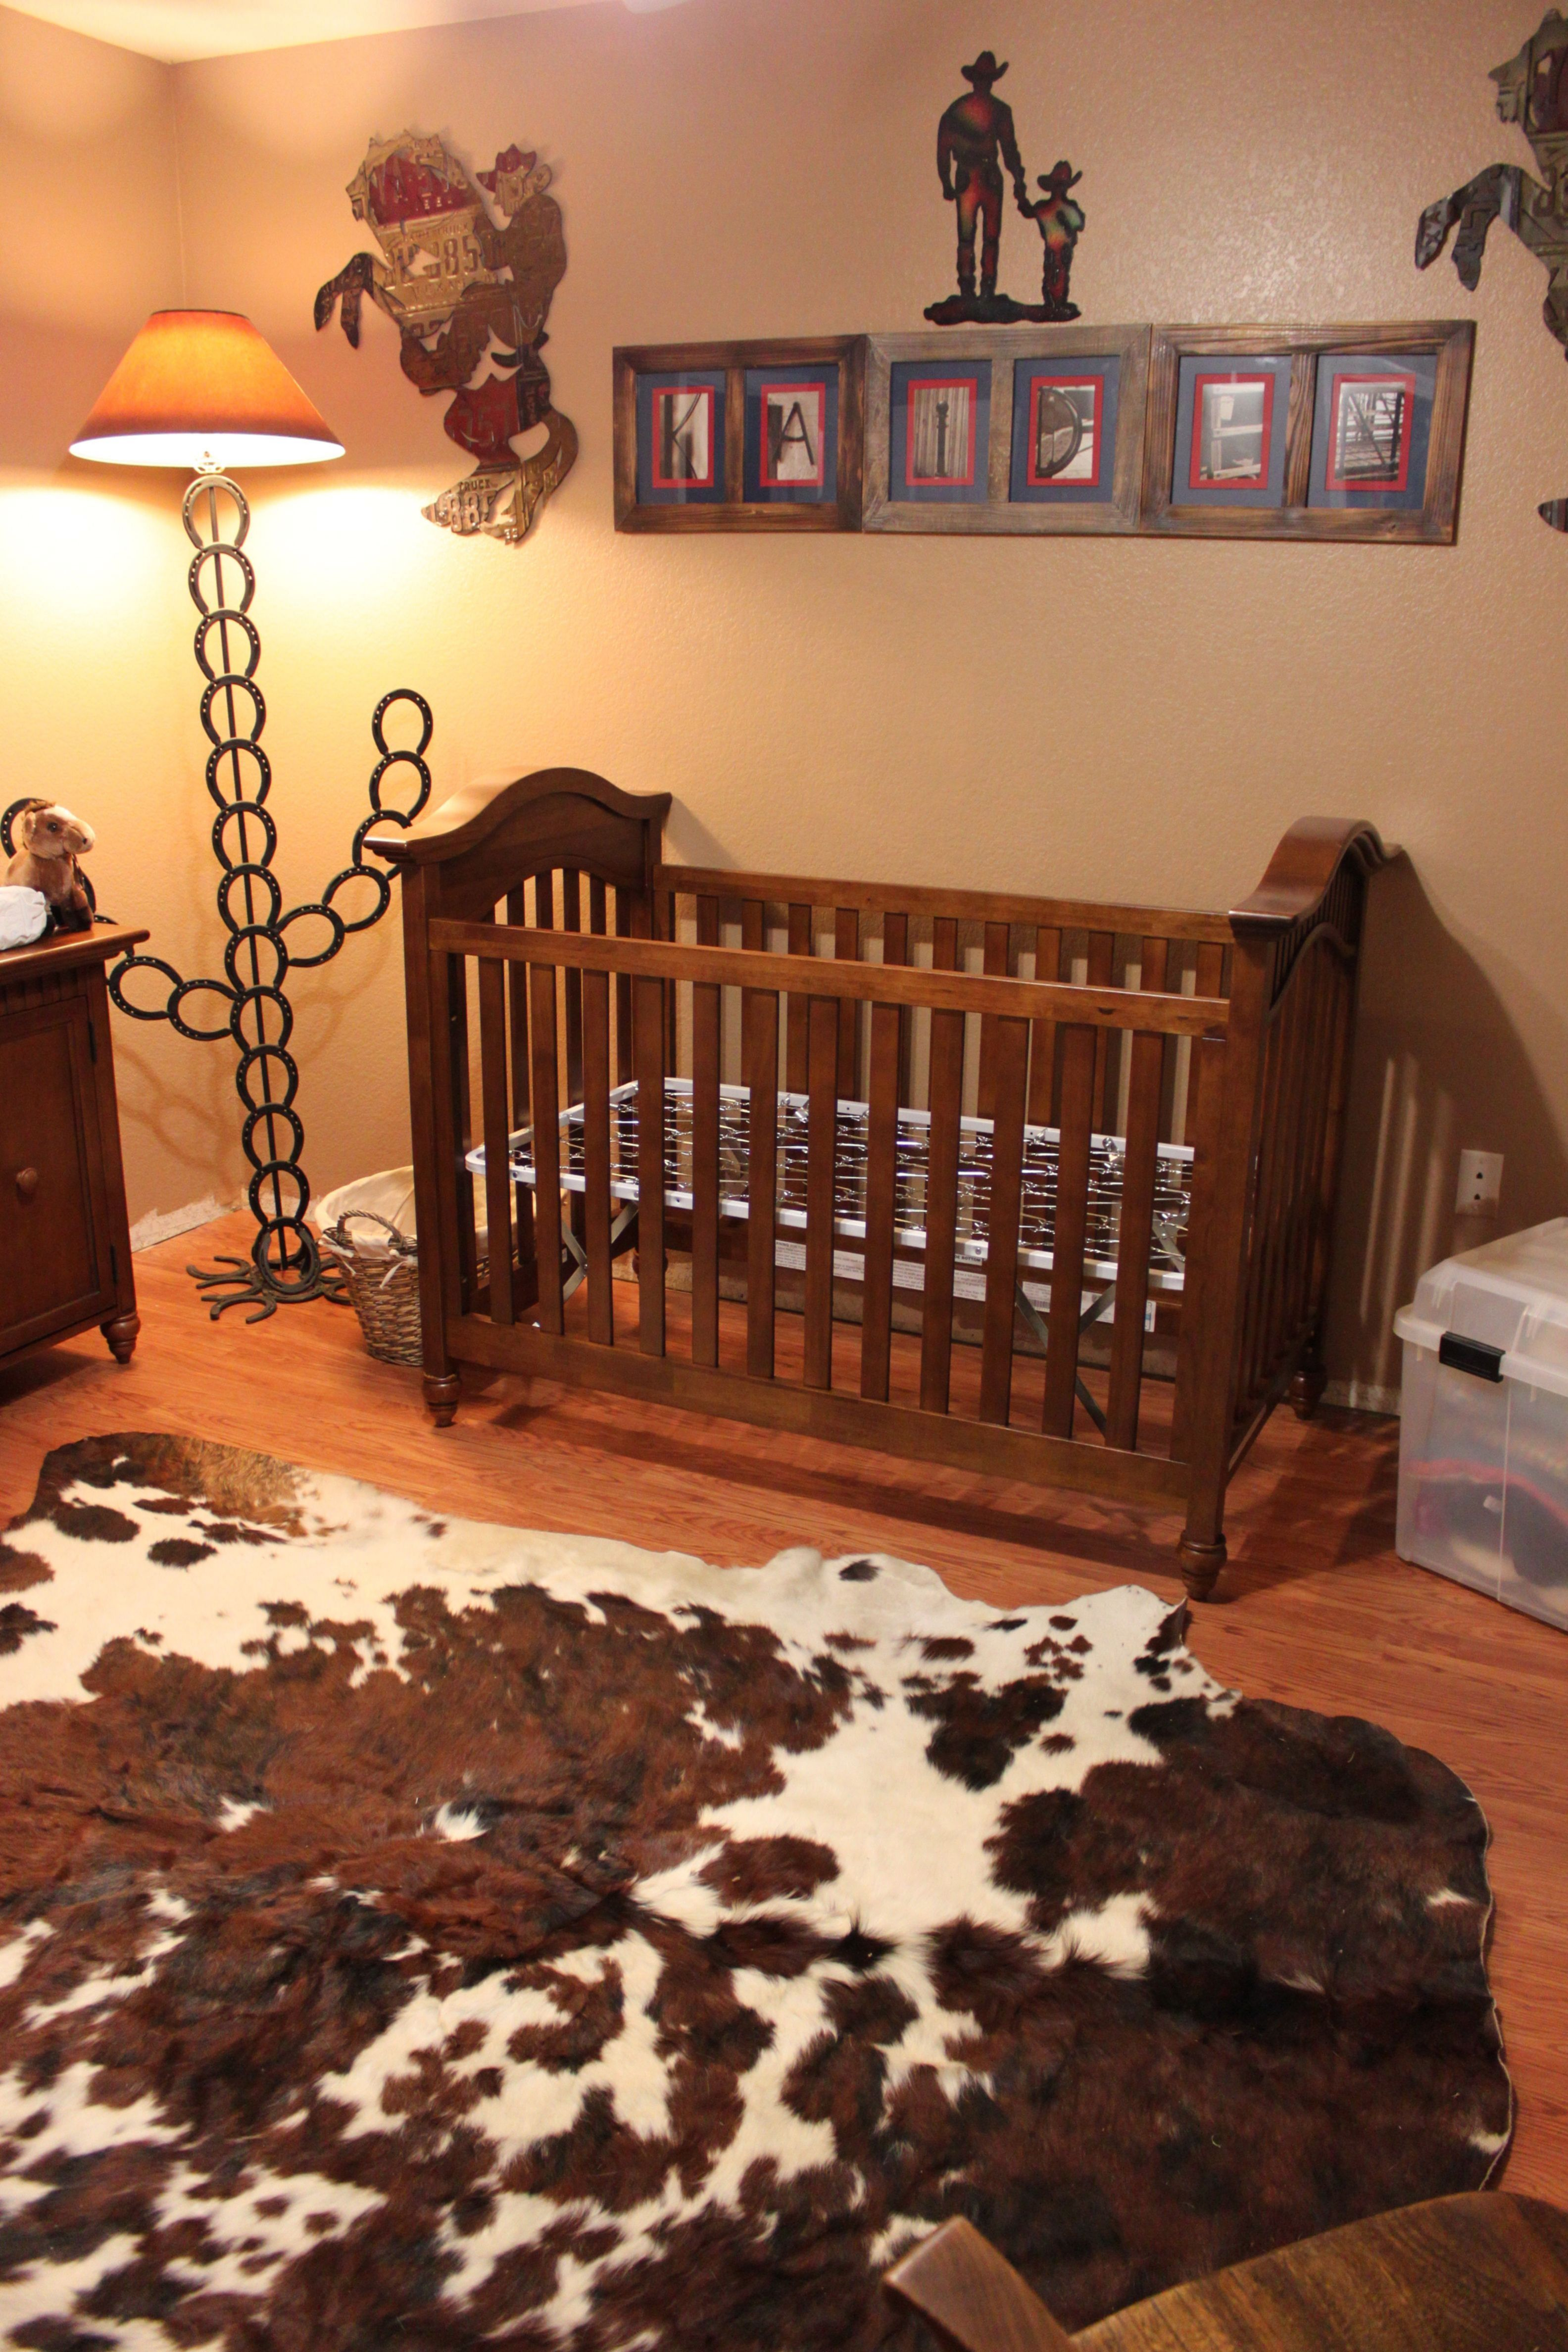 wonderful bedroom decorating ideas | Top 8 Wonderful Horse Theme Bedroom Decorating Ideas ...